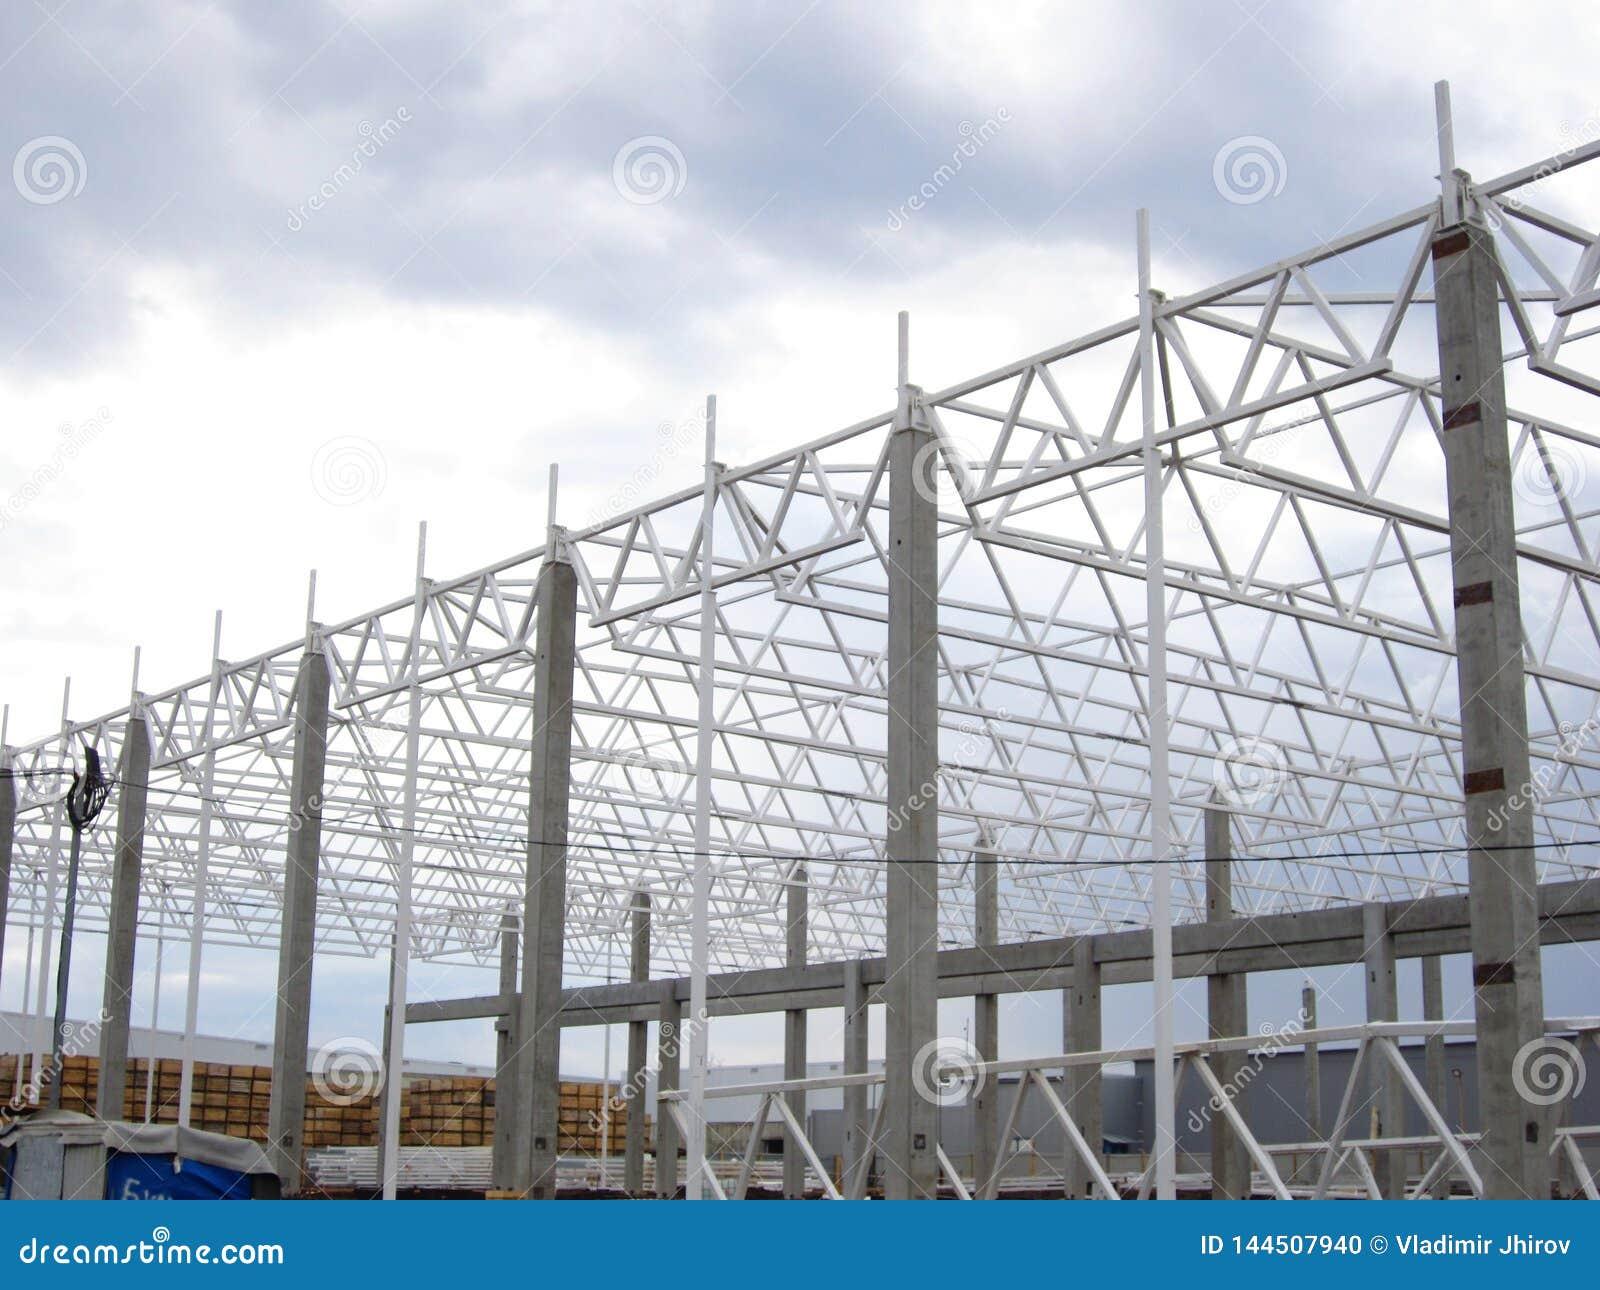 Bau einer Metallrahmenanlage